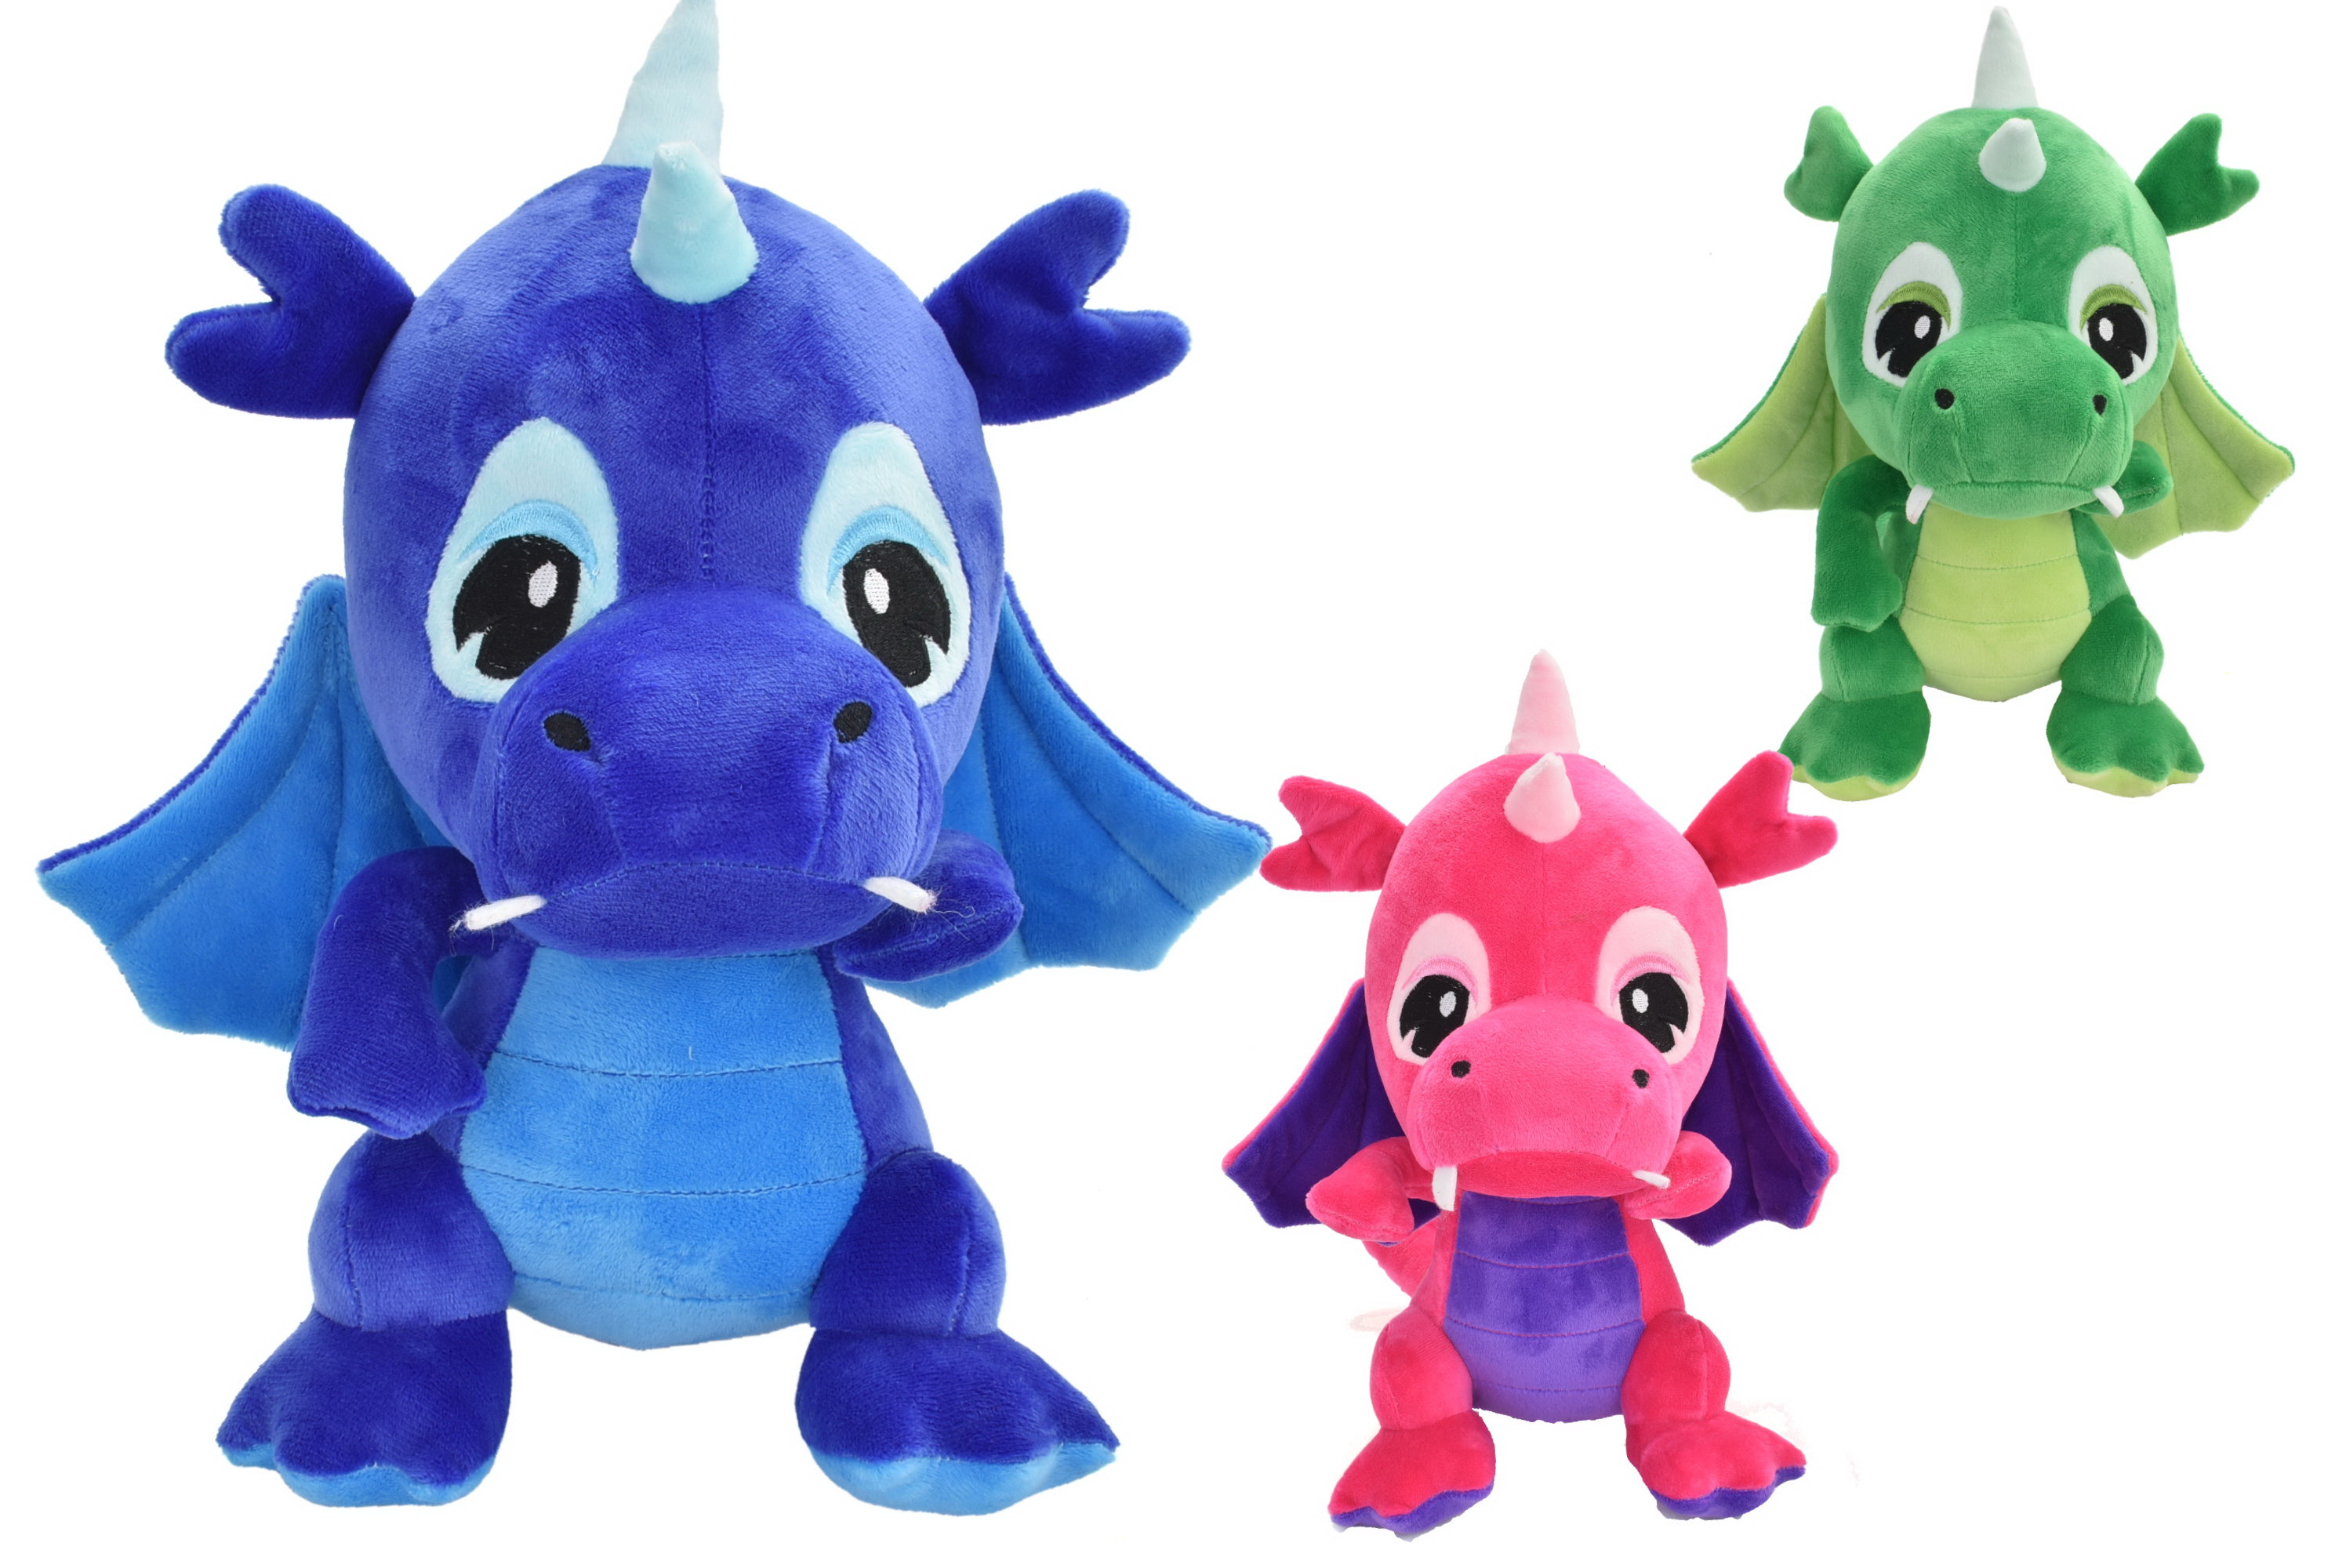 26cm Plush Dragons - 3 Assorted Colours